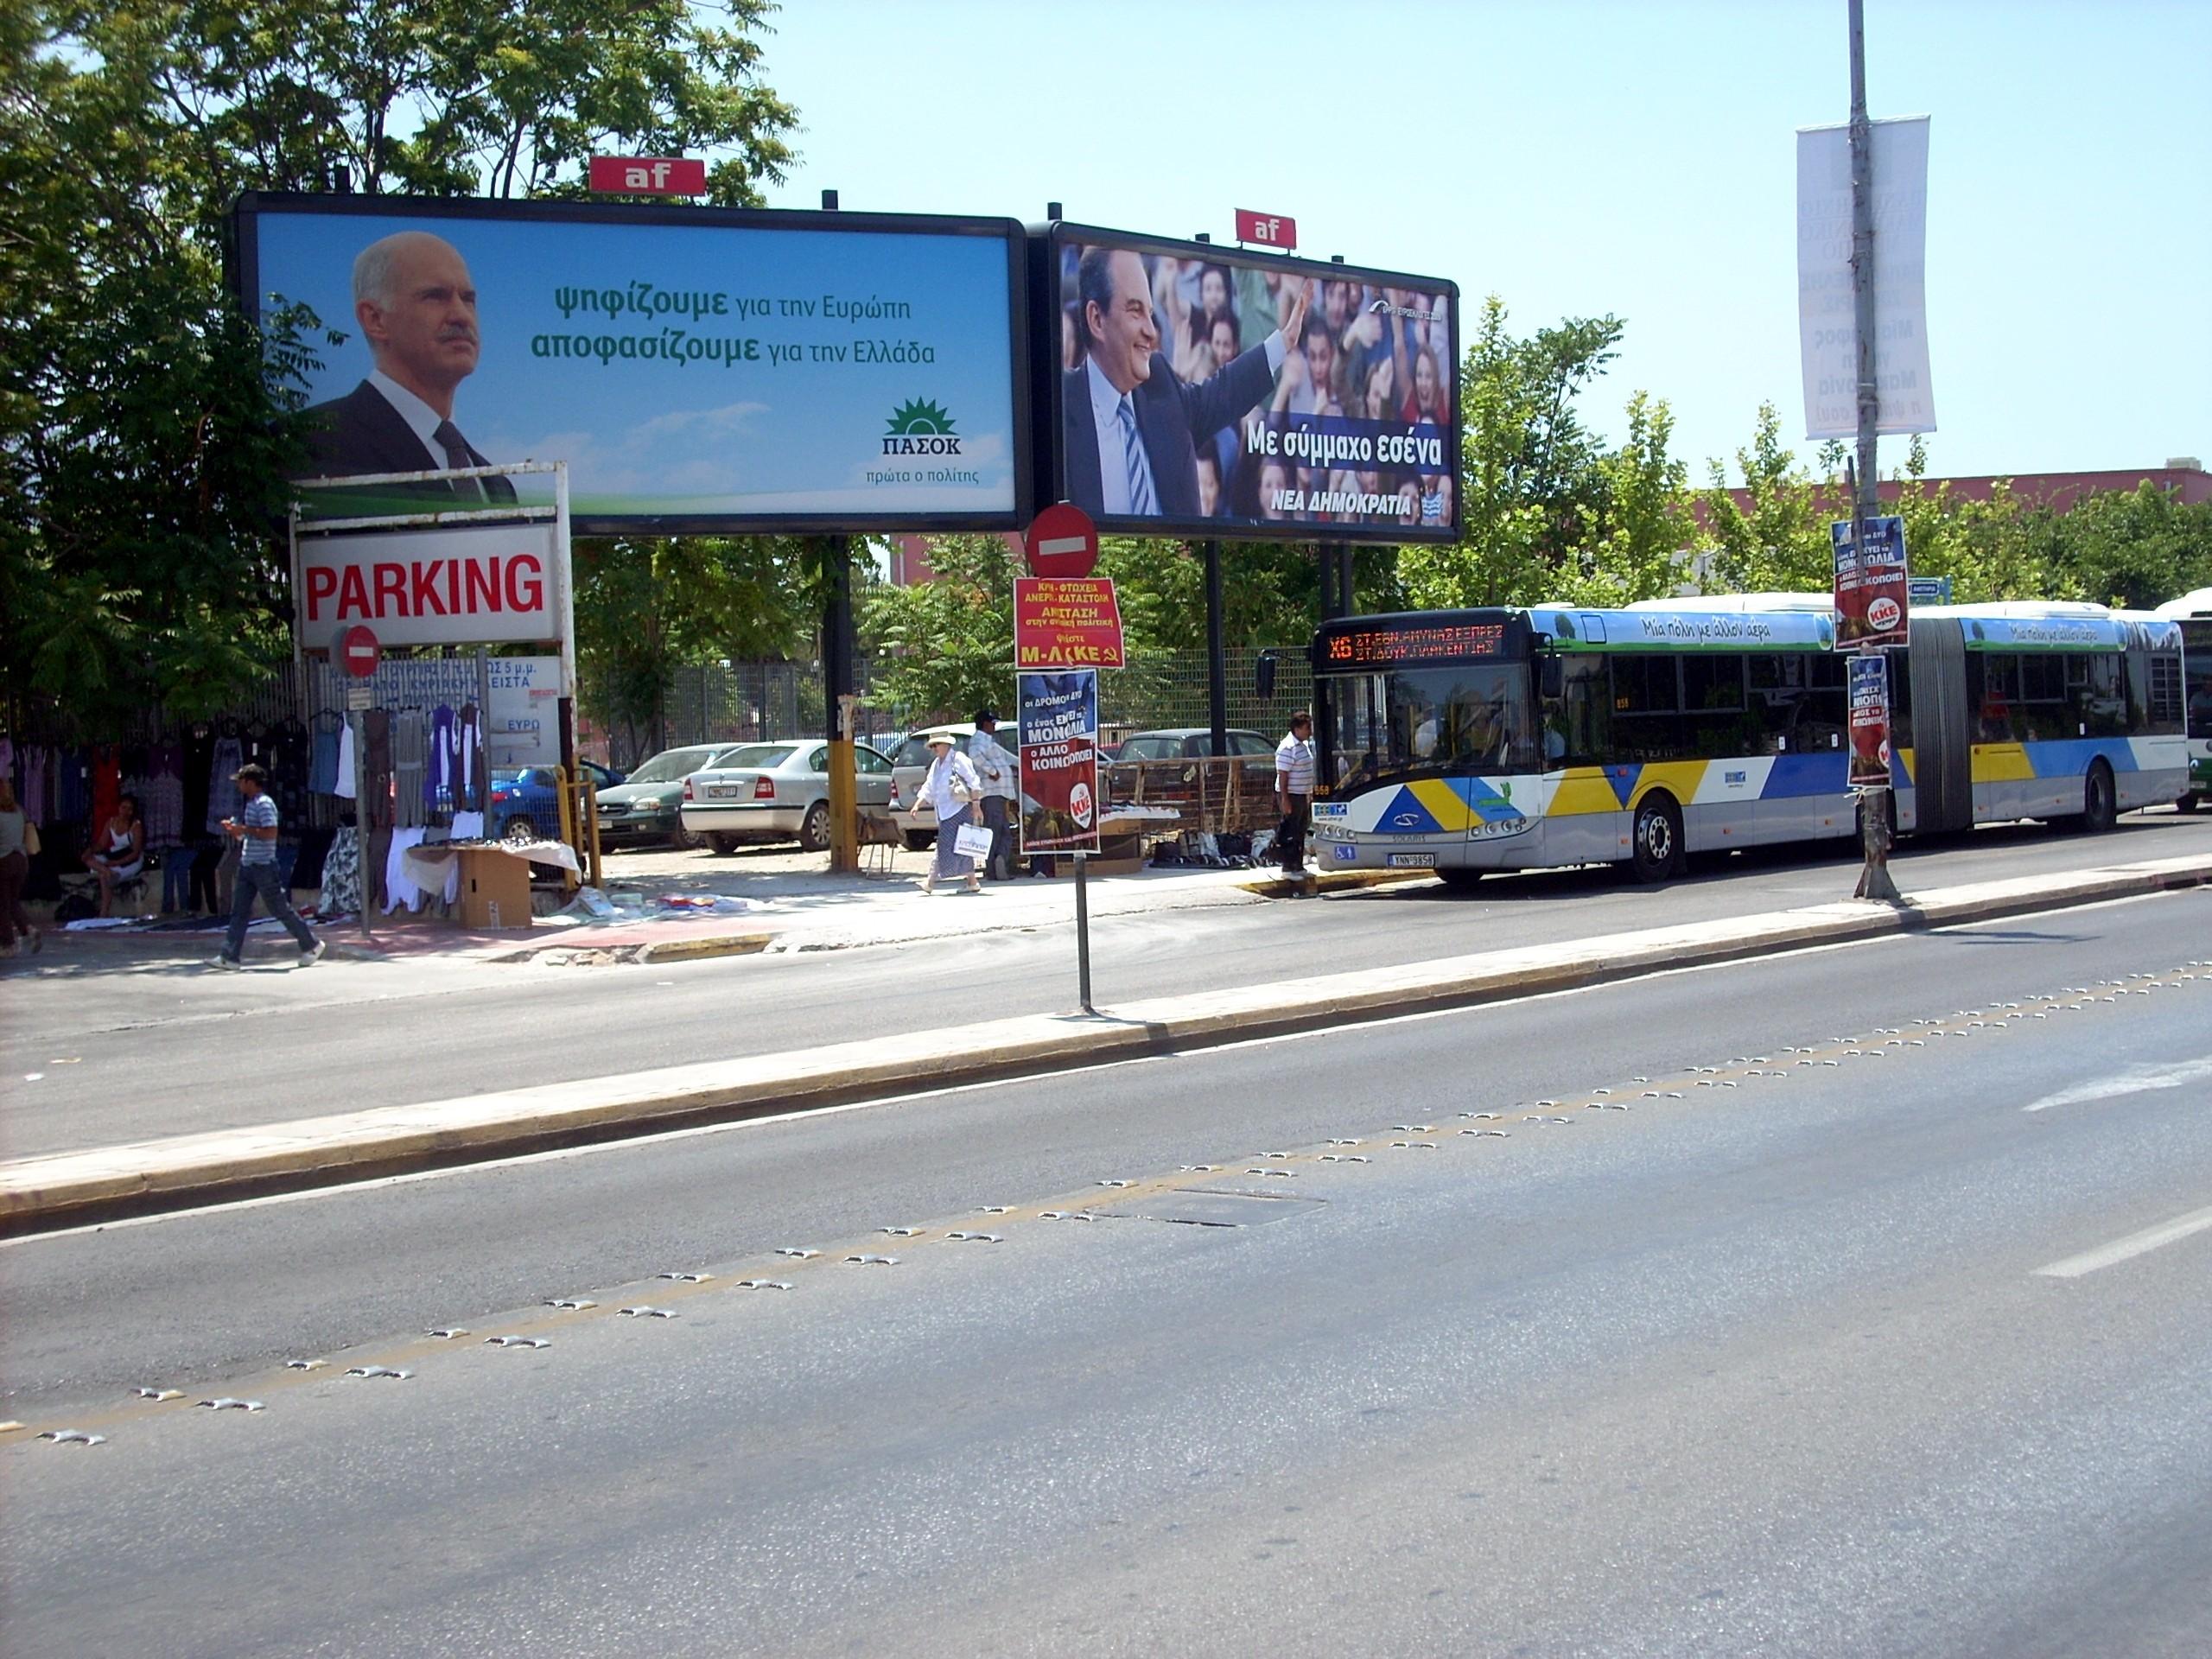 http://upload.wikimedia.org/wikipedia/commons/5/50/Bus_stop_near_Ethniki_Amina.jpg